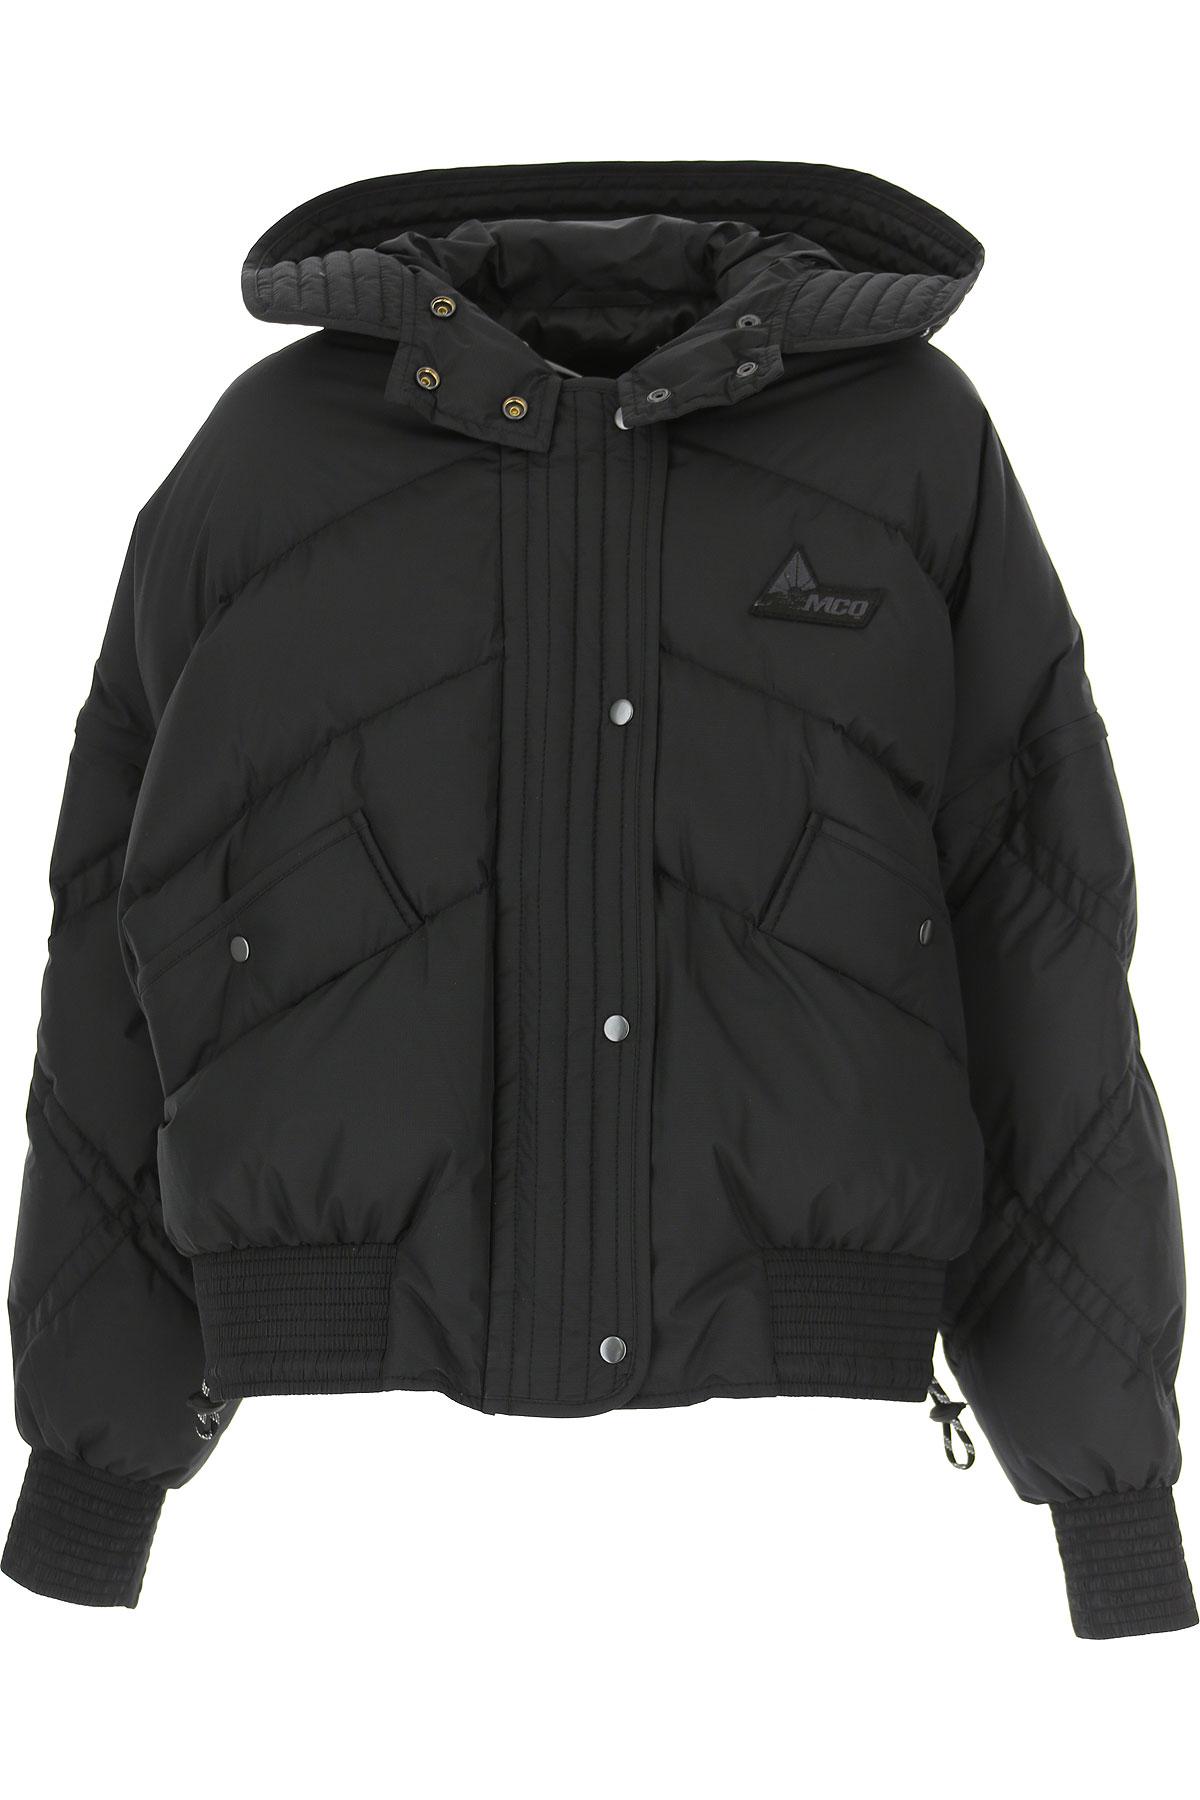 Alexander McQueen McQ Down Jacket for Women, Puffer Ski Jacket On Sale, Black, polyestere, 2019, 4 6